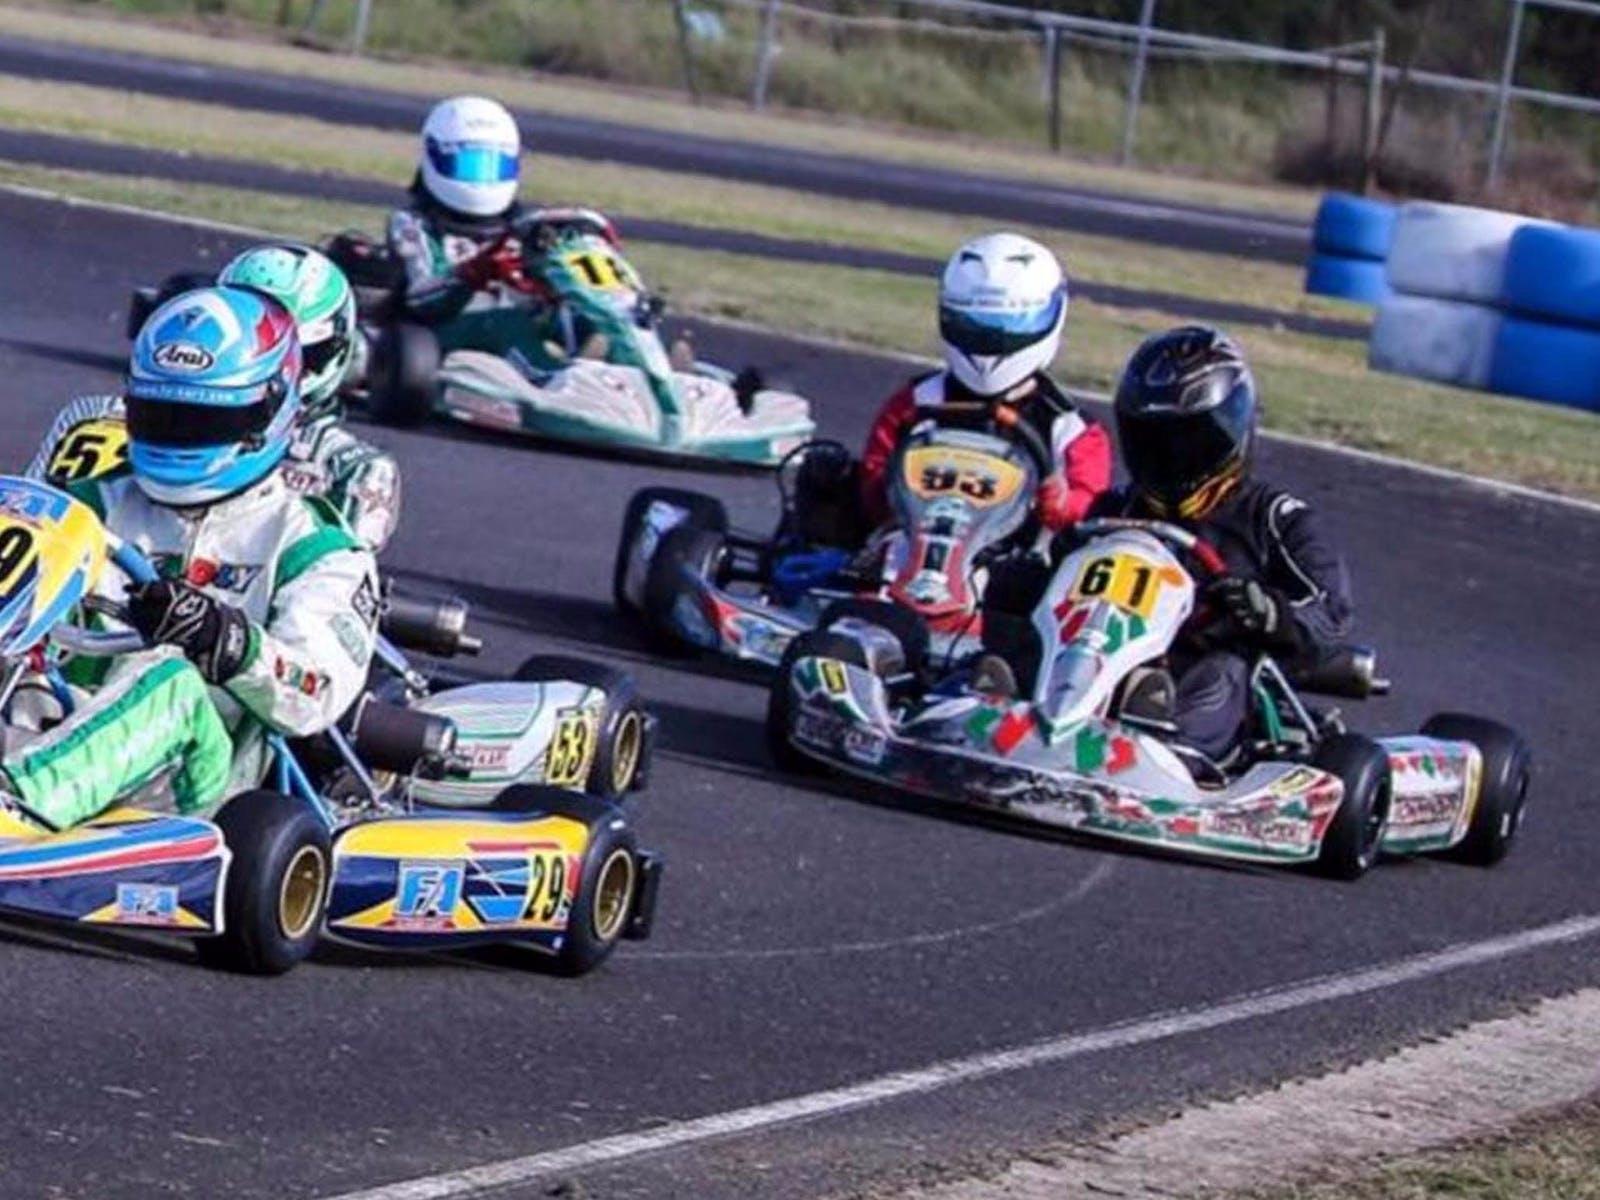 Karting championships